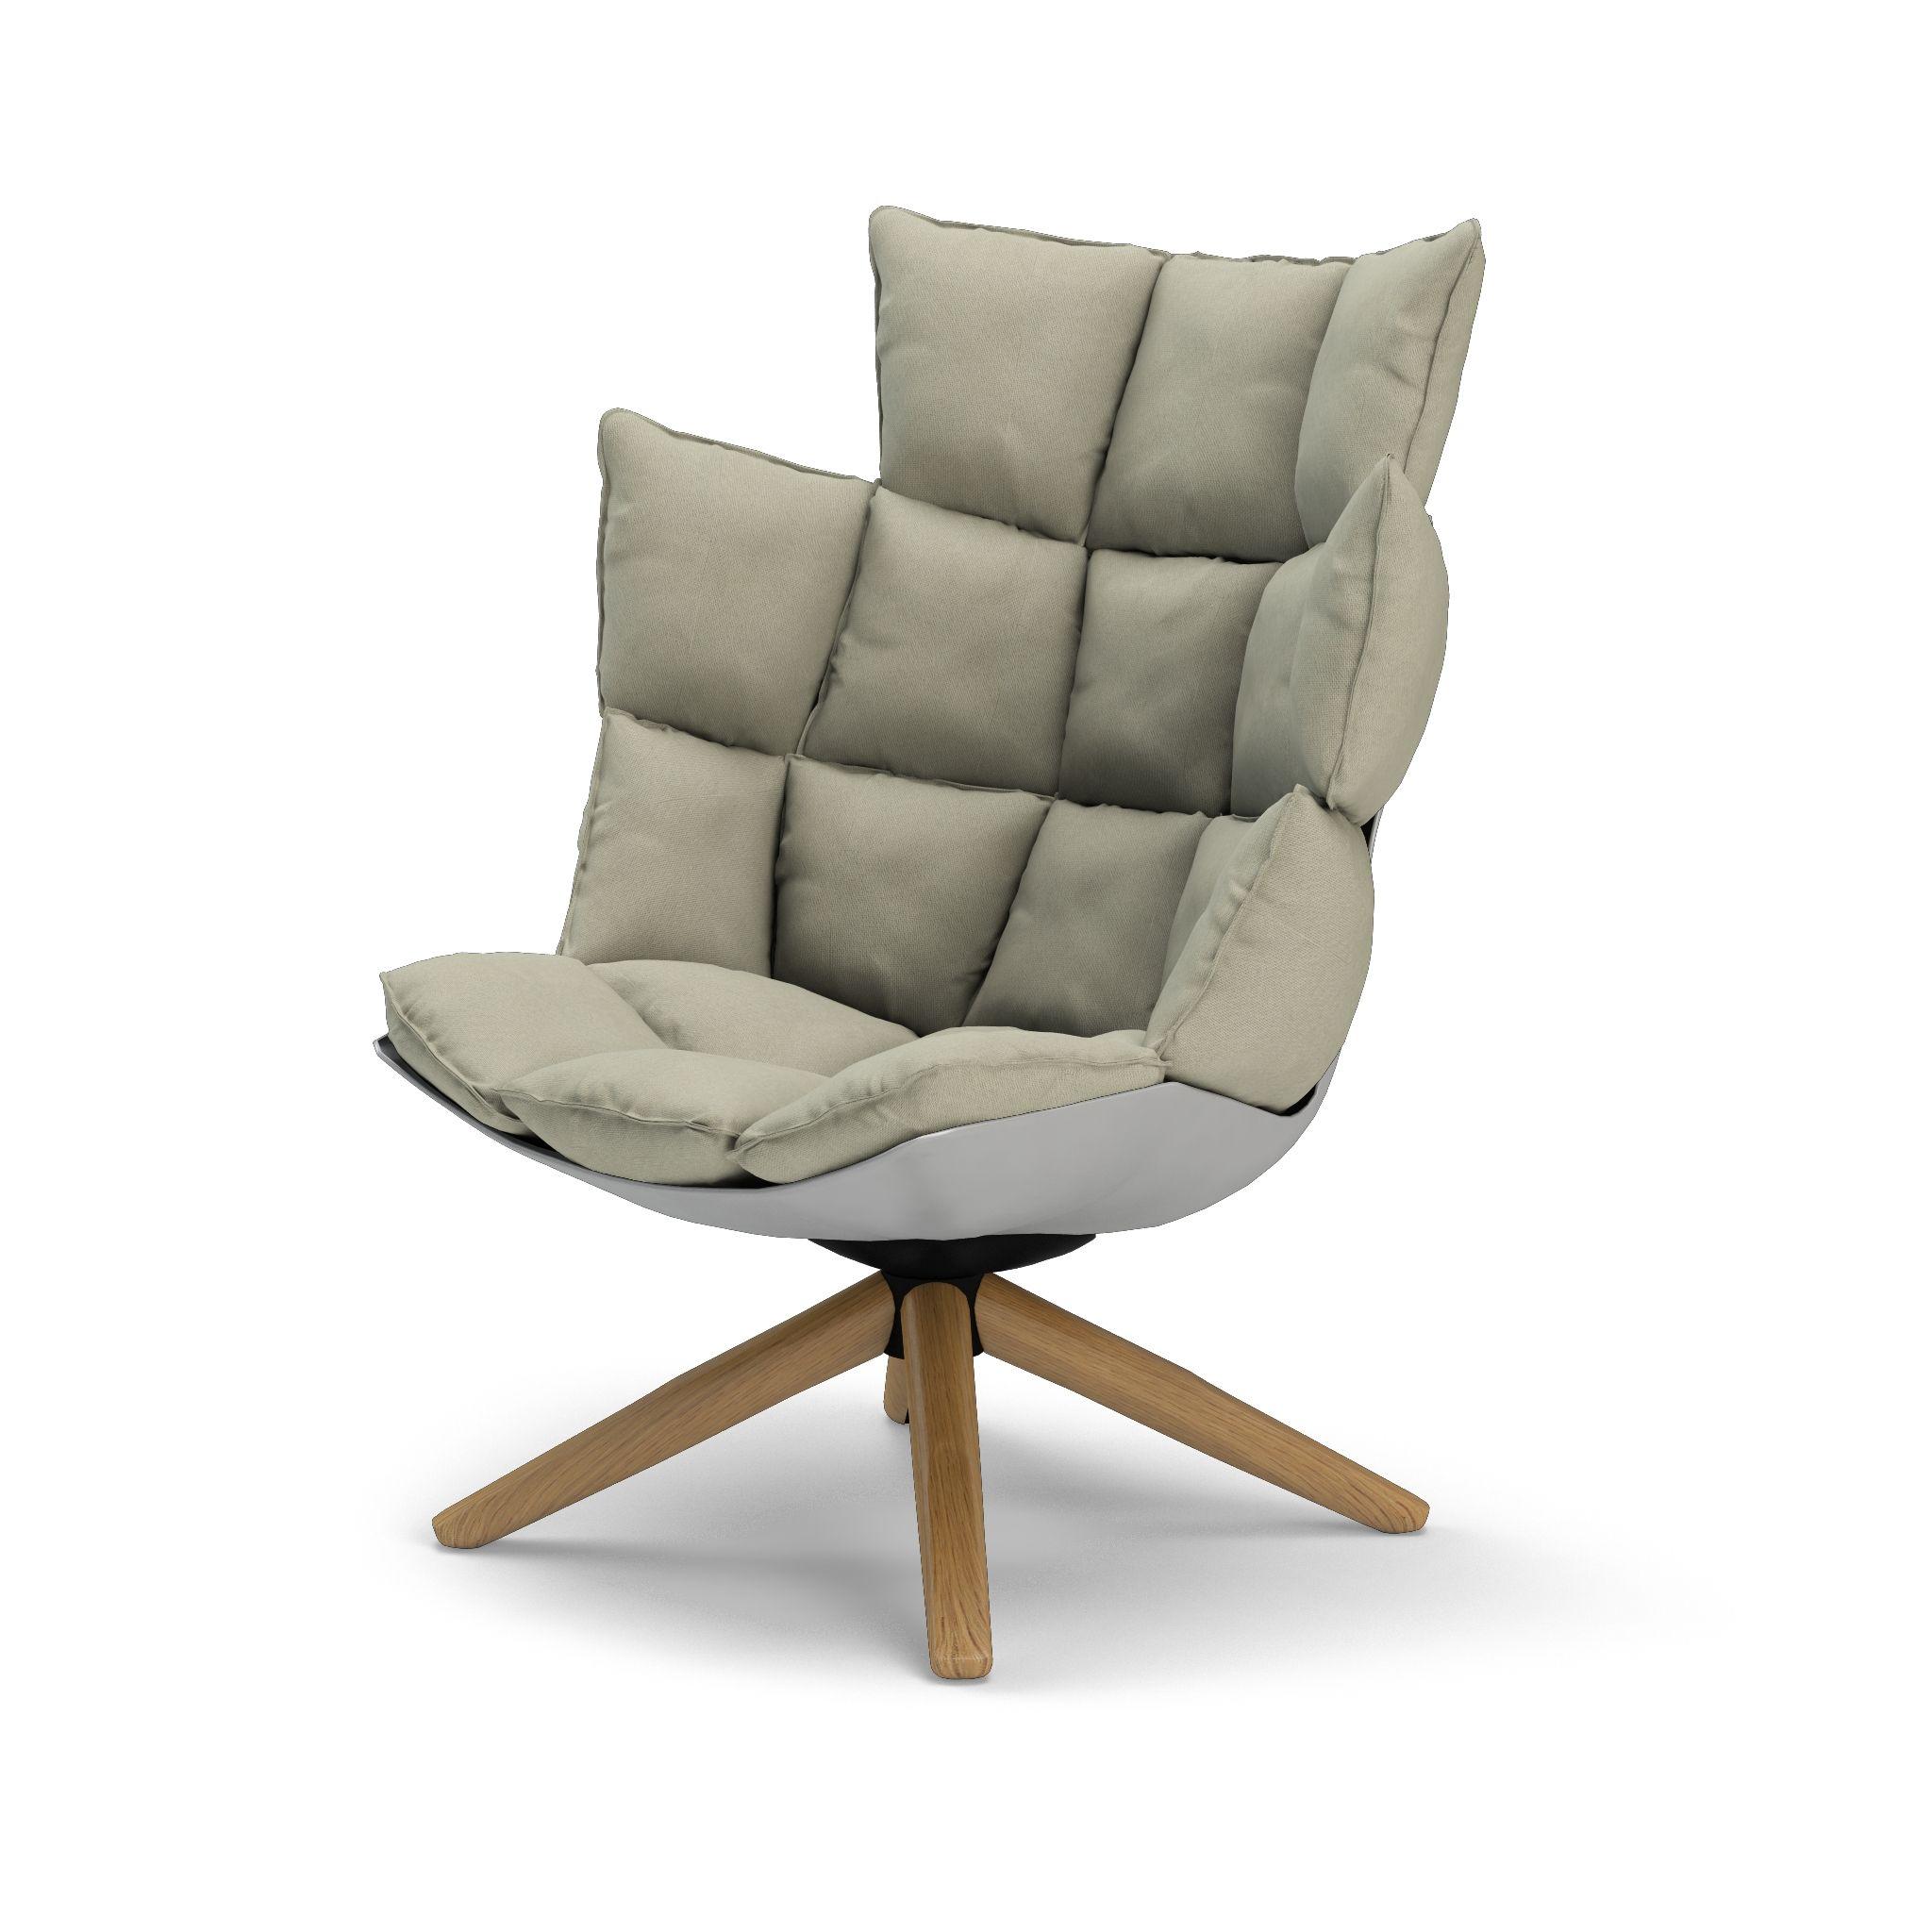 Contemporary Home Style By B B Italia: B&B Italia Husk Chair By Patricia Urquiola